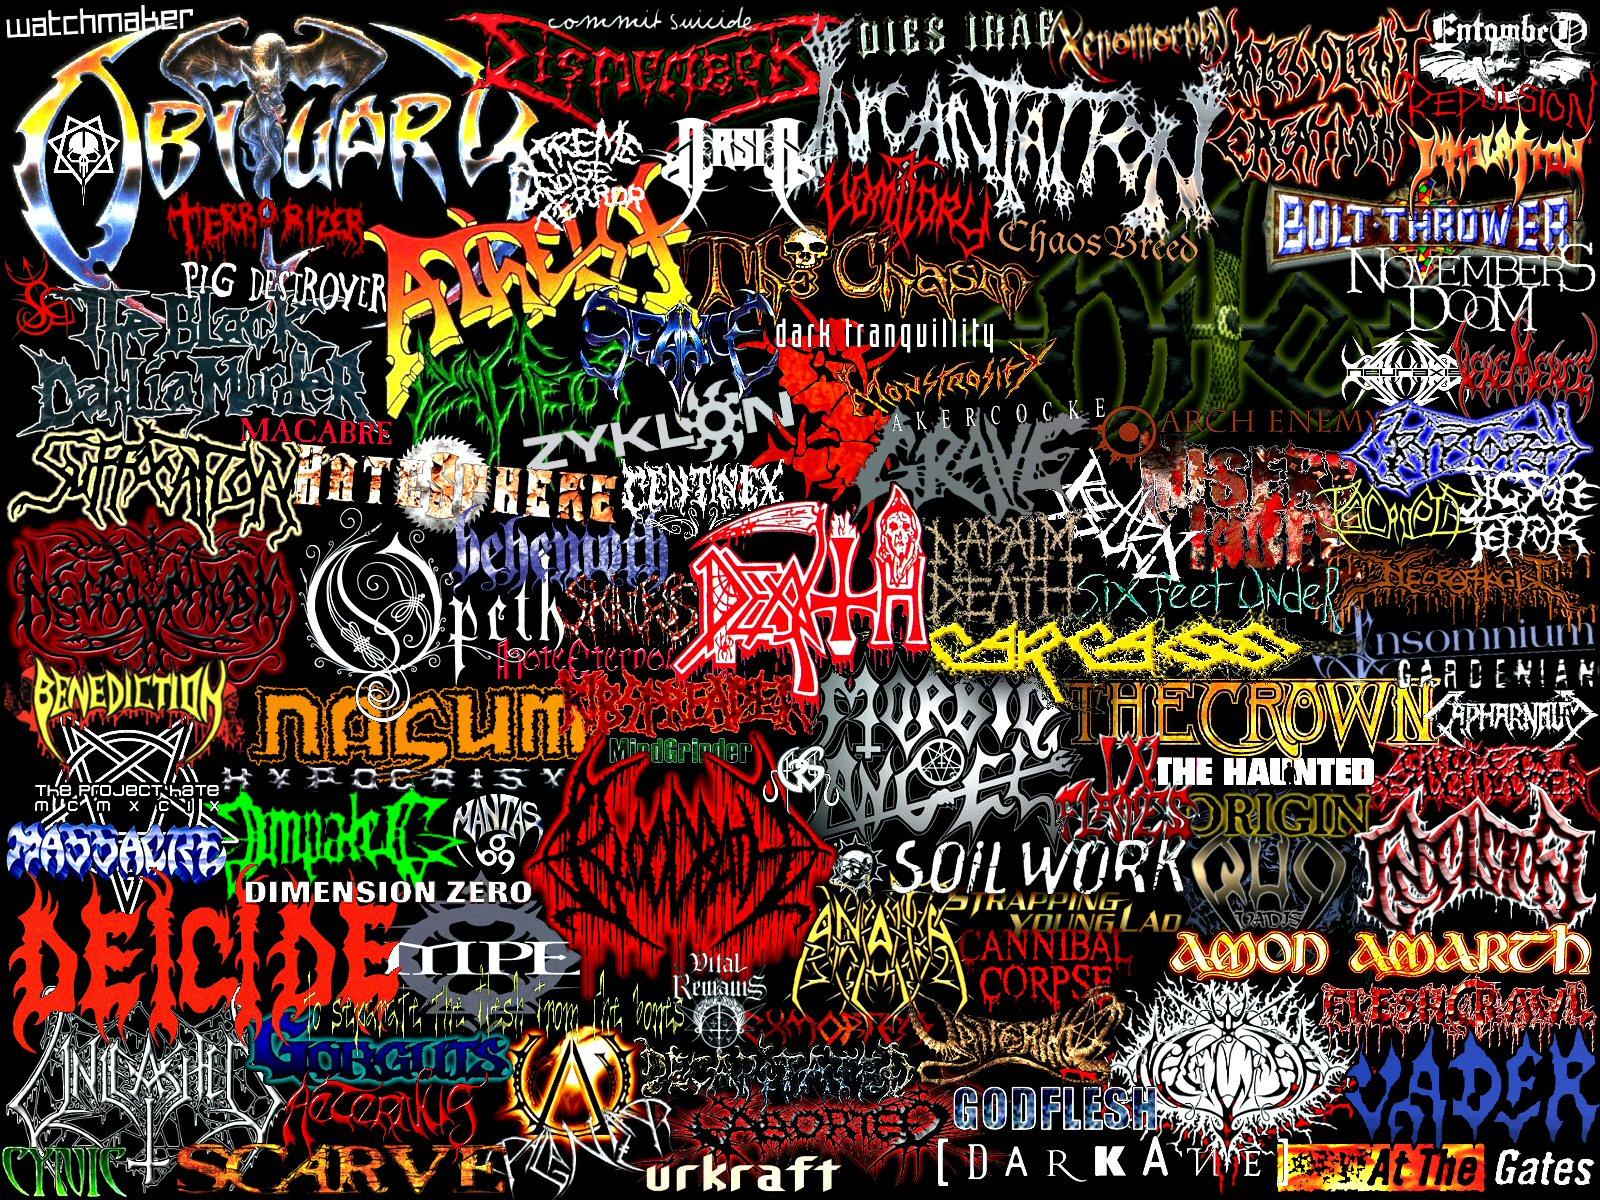 UP THE IRONS-Το καλύτερο rock ραδιόφωνο!  Death-metal